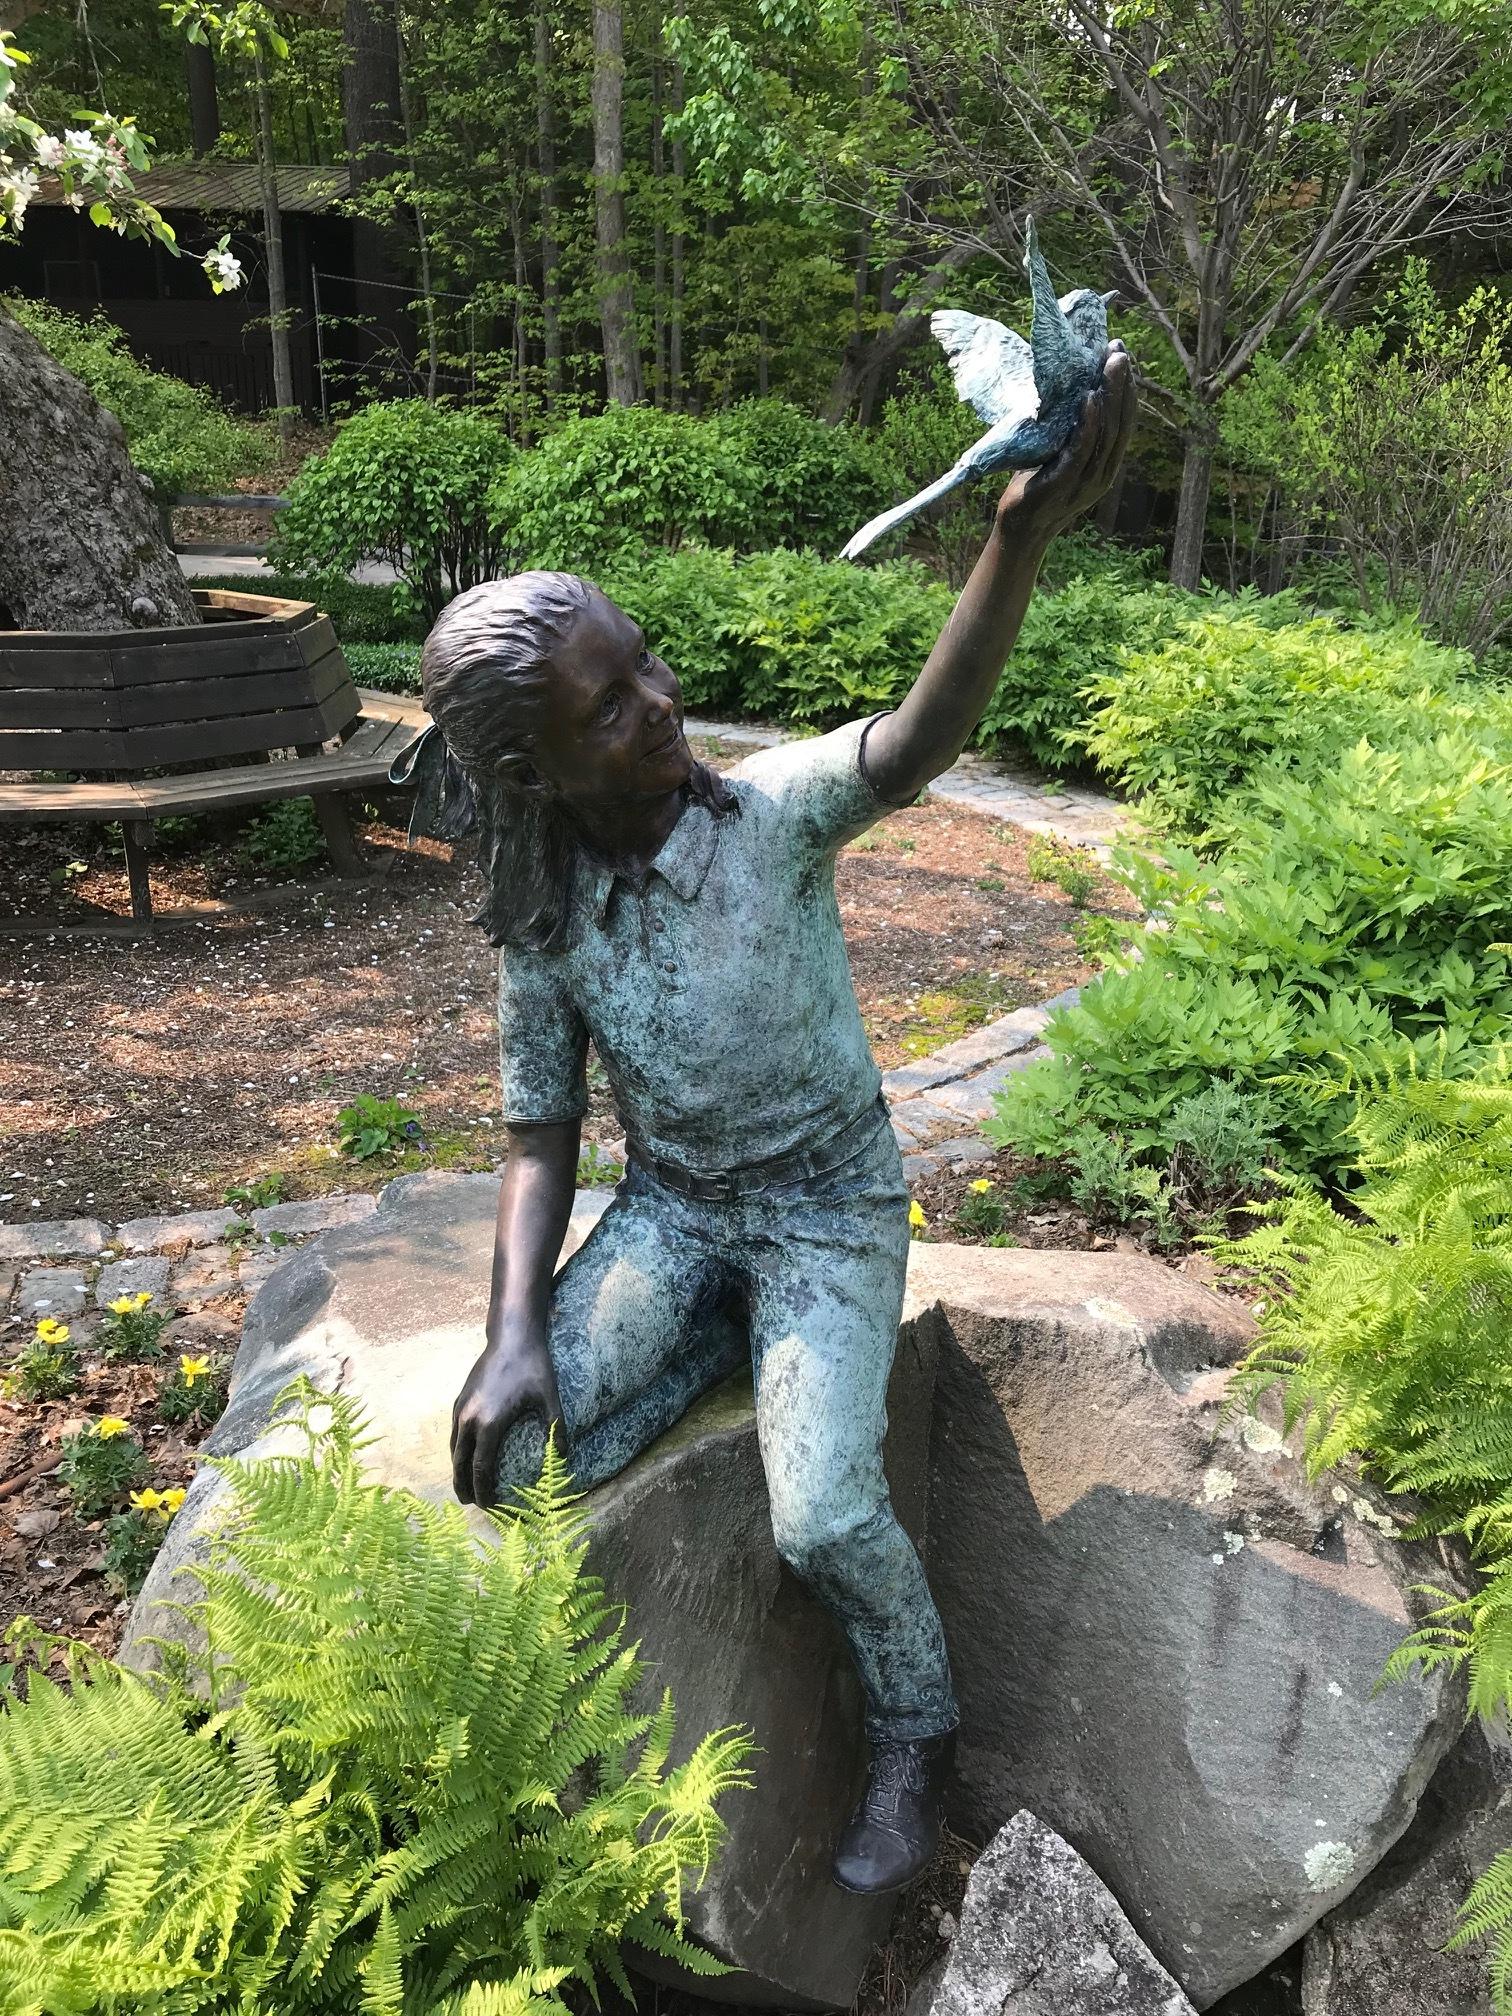 Charming sculpture at Kirkwood Garden